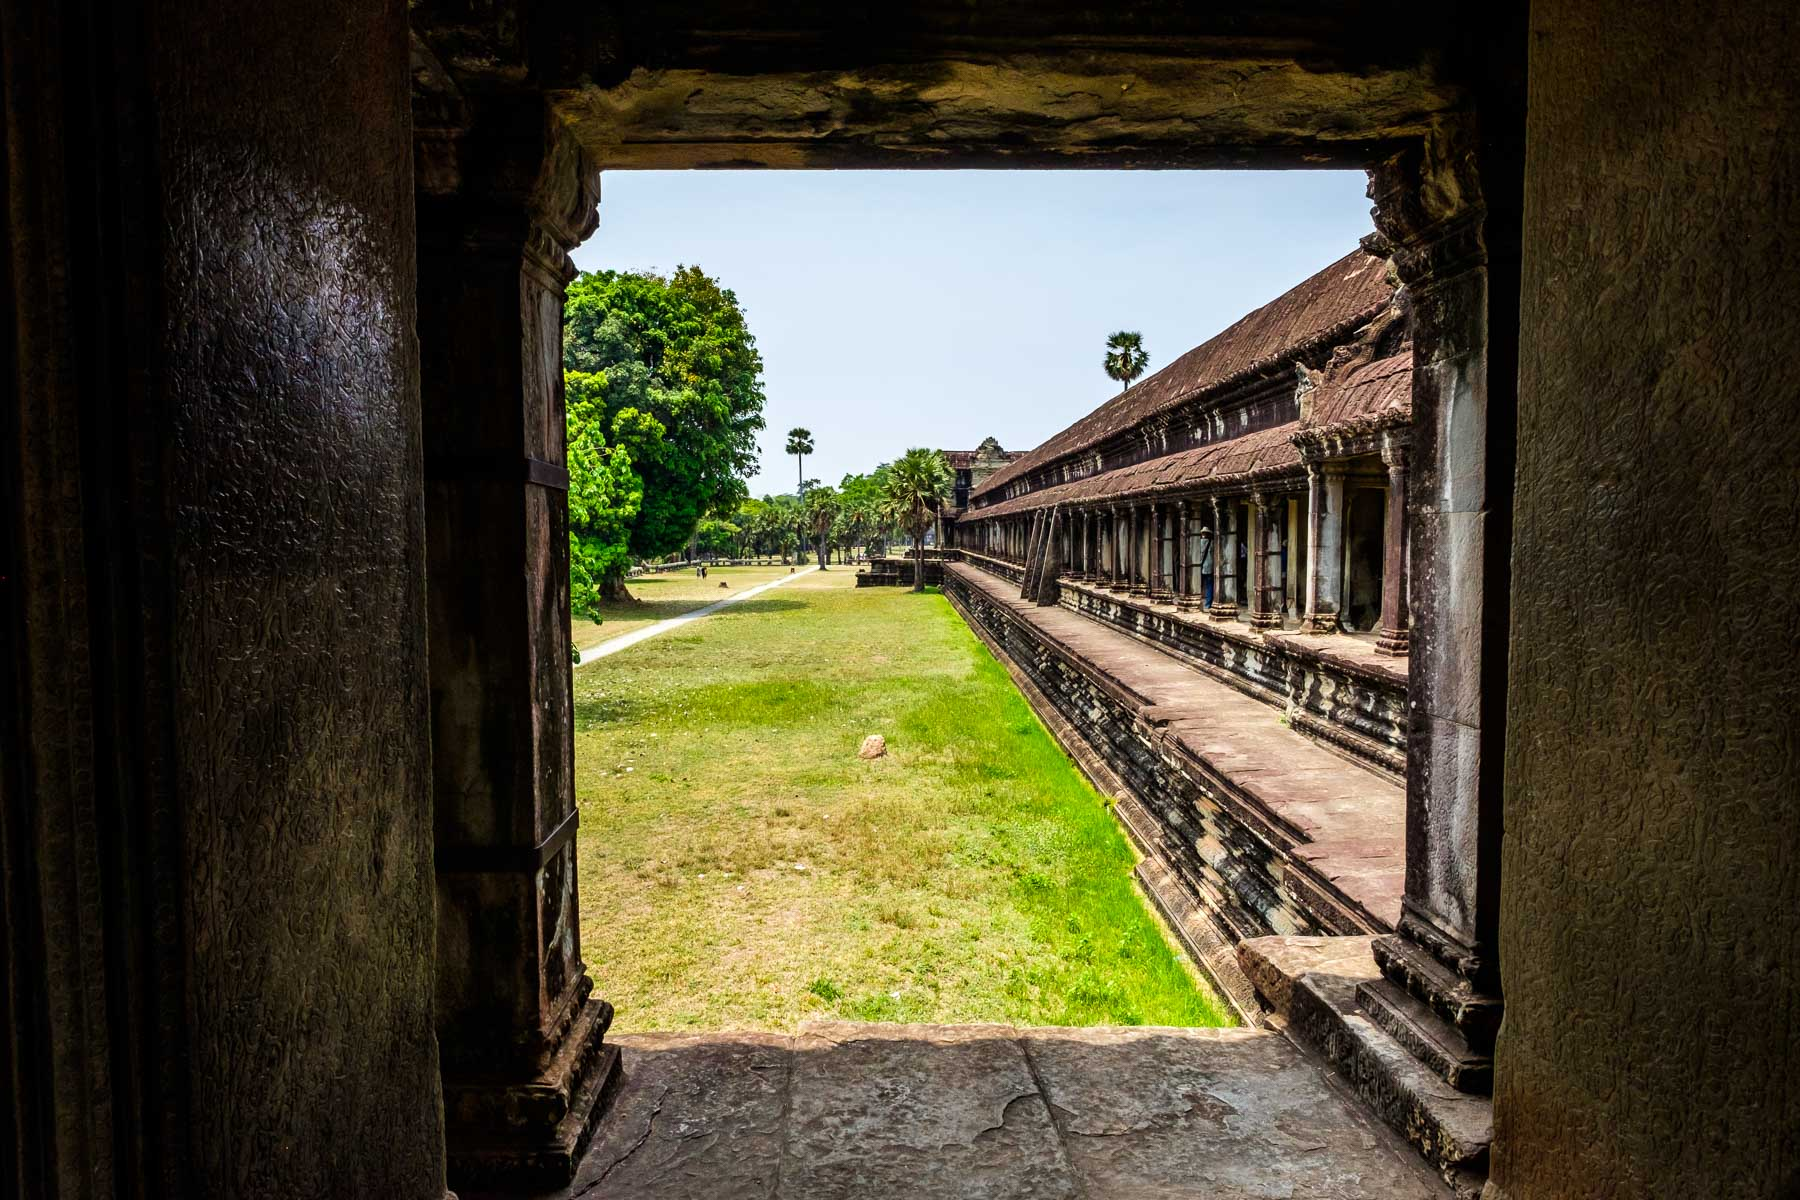 View through window Angkor Wat Cambodia